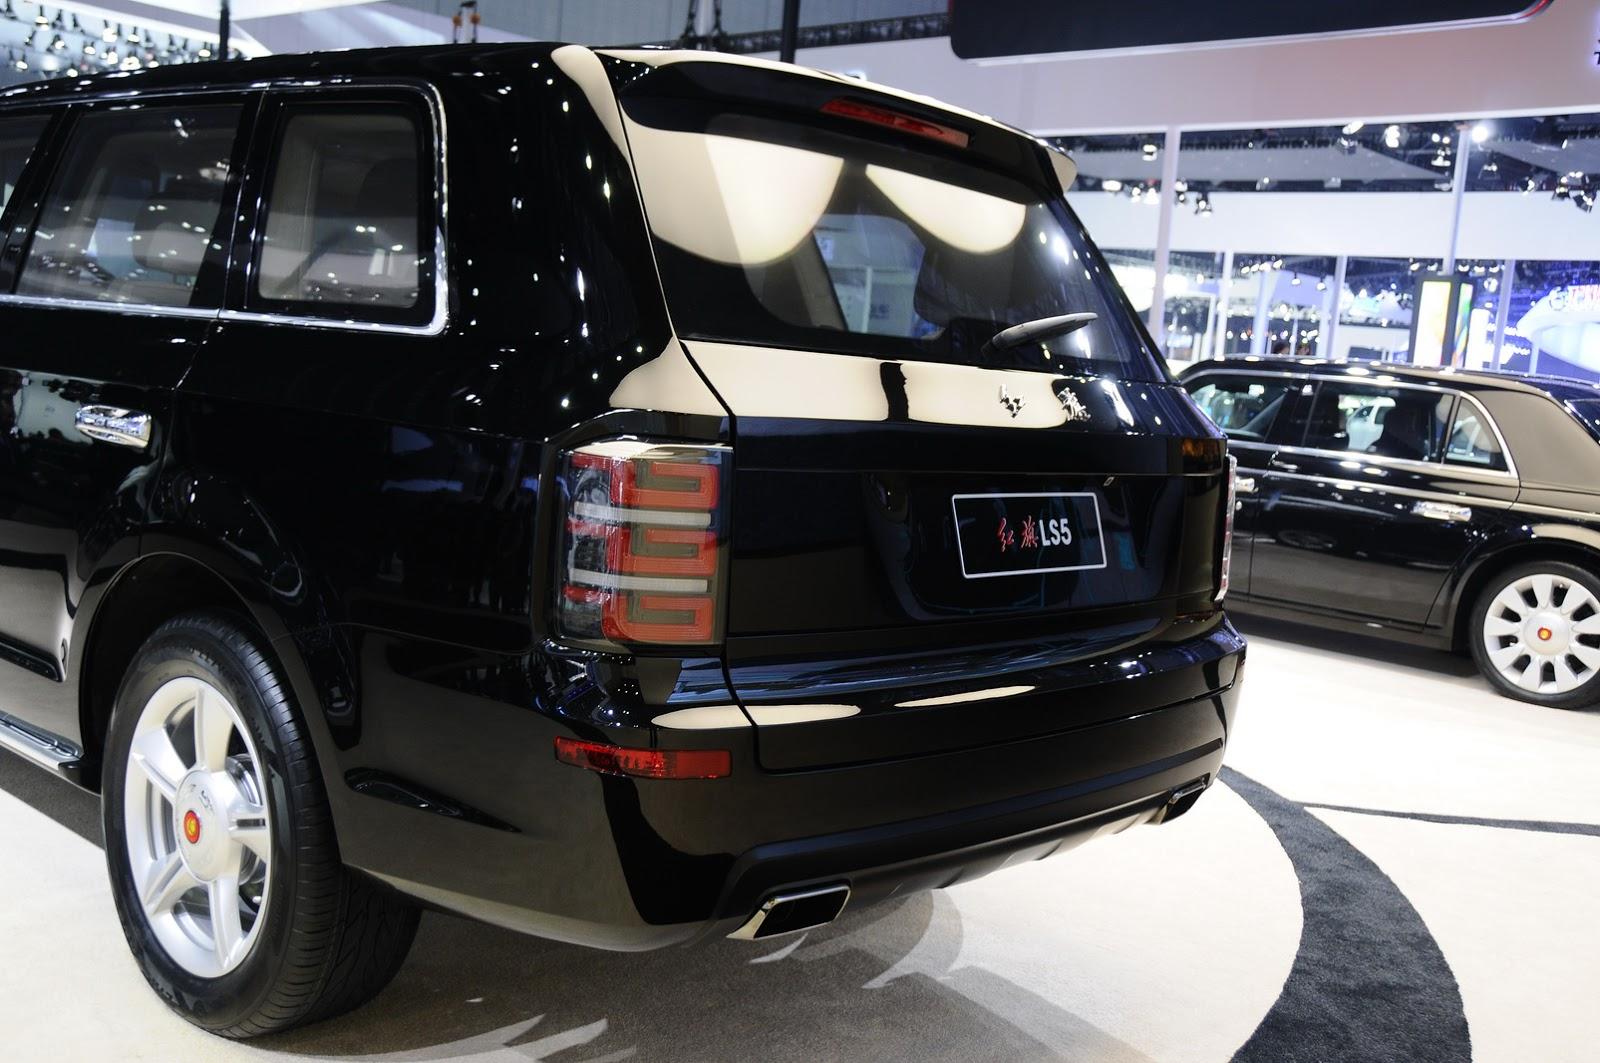 2015 - [Chine] Salon Auto de Shanghai - Page 2 Hongqi-LS5-6